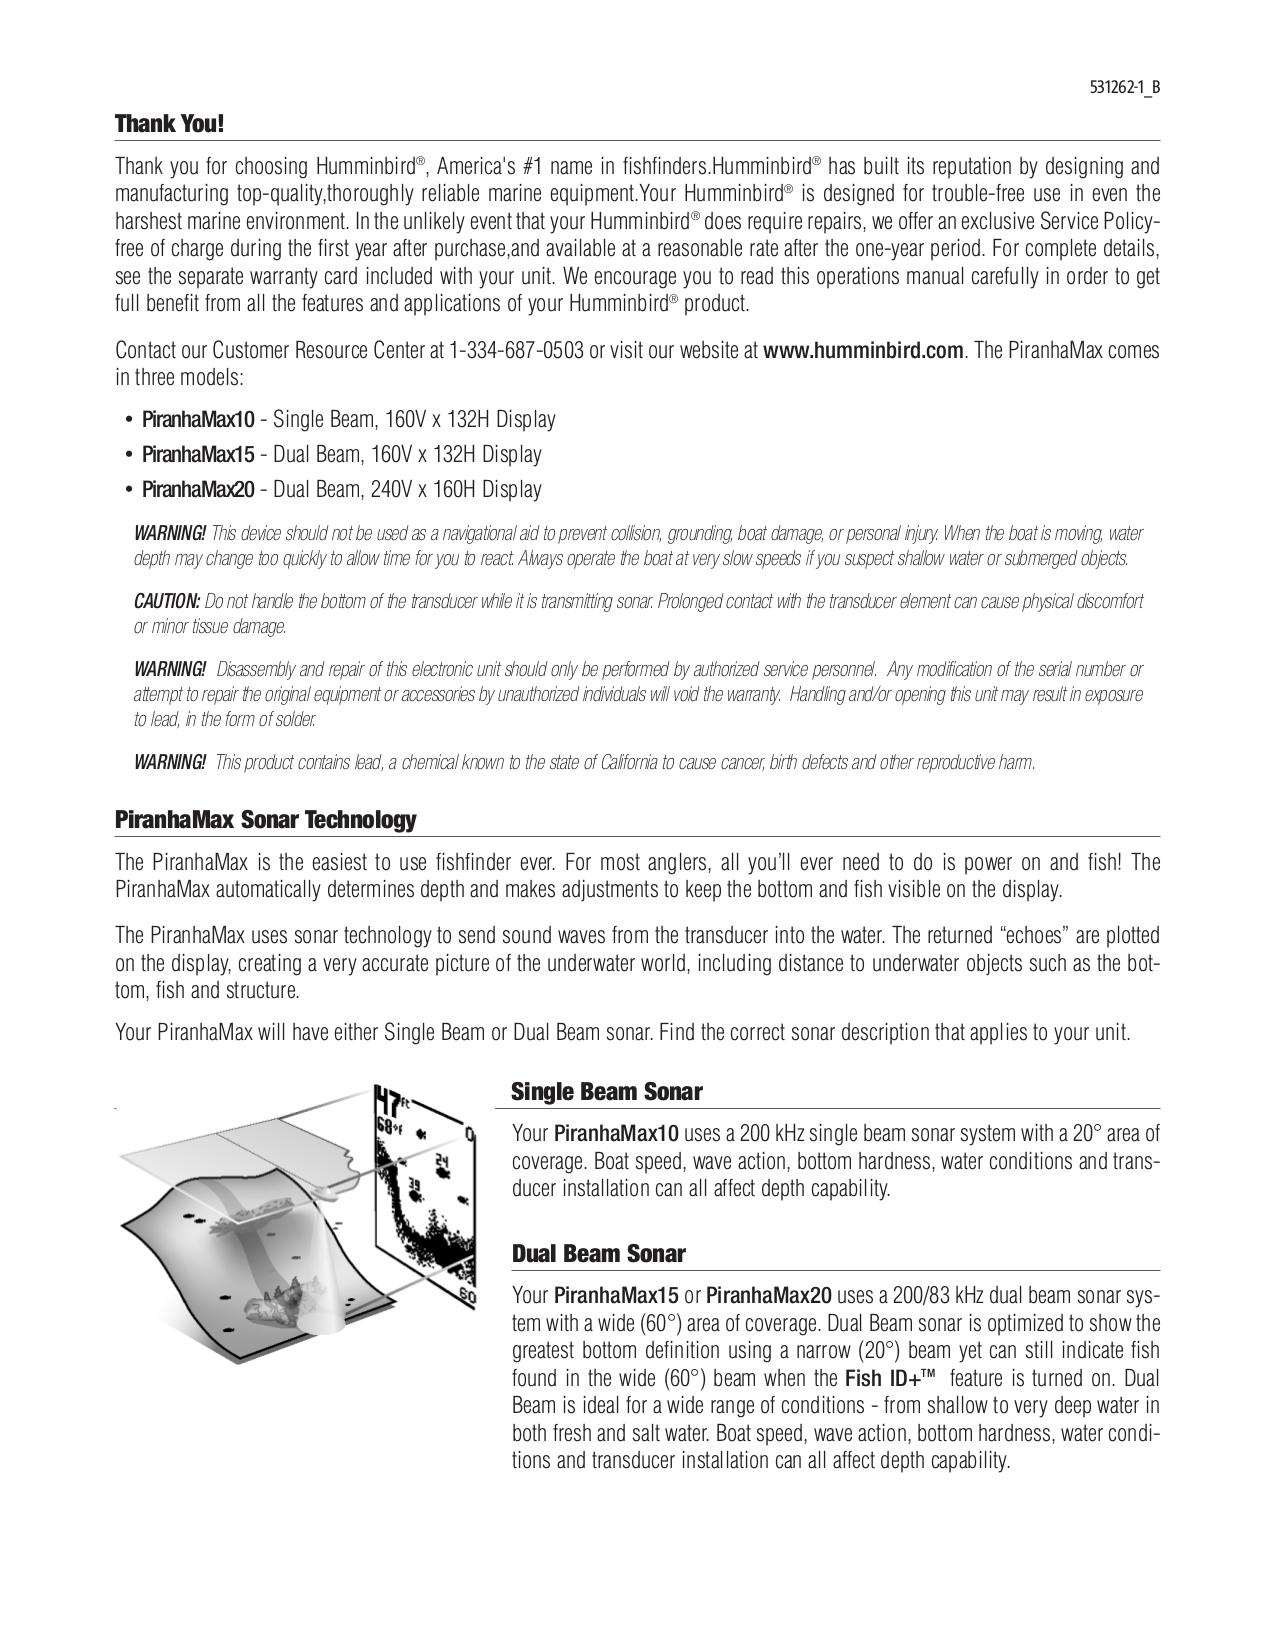 pdf for Humminbird GPS Piranha Max 10 manual